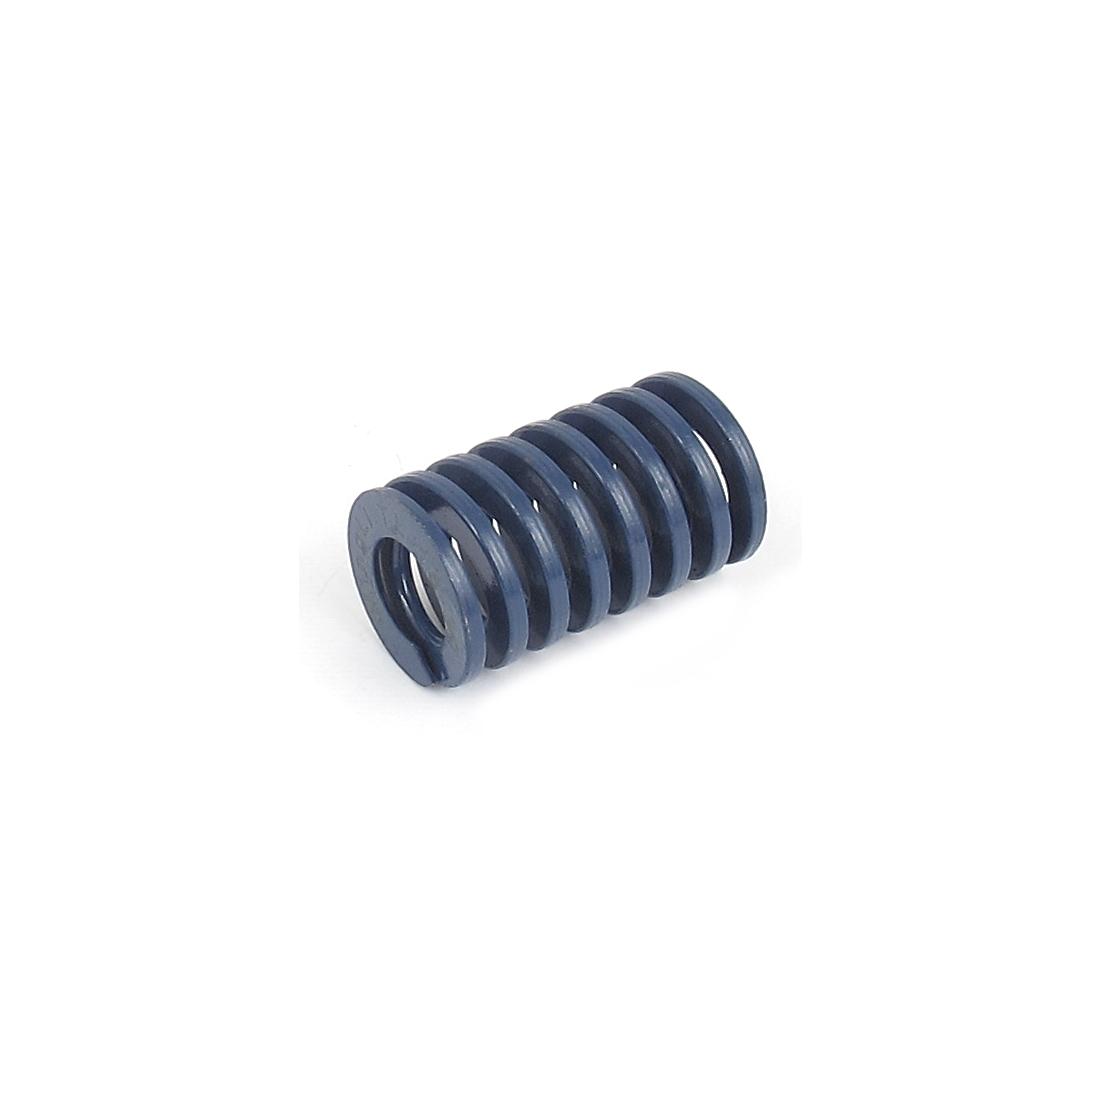 18mmx30mm Chromium Alloy Steel Light Load Die Spring Blue